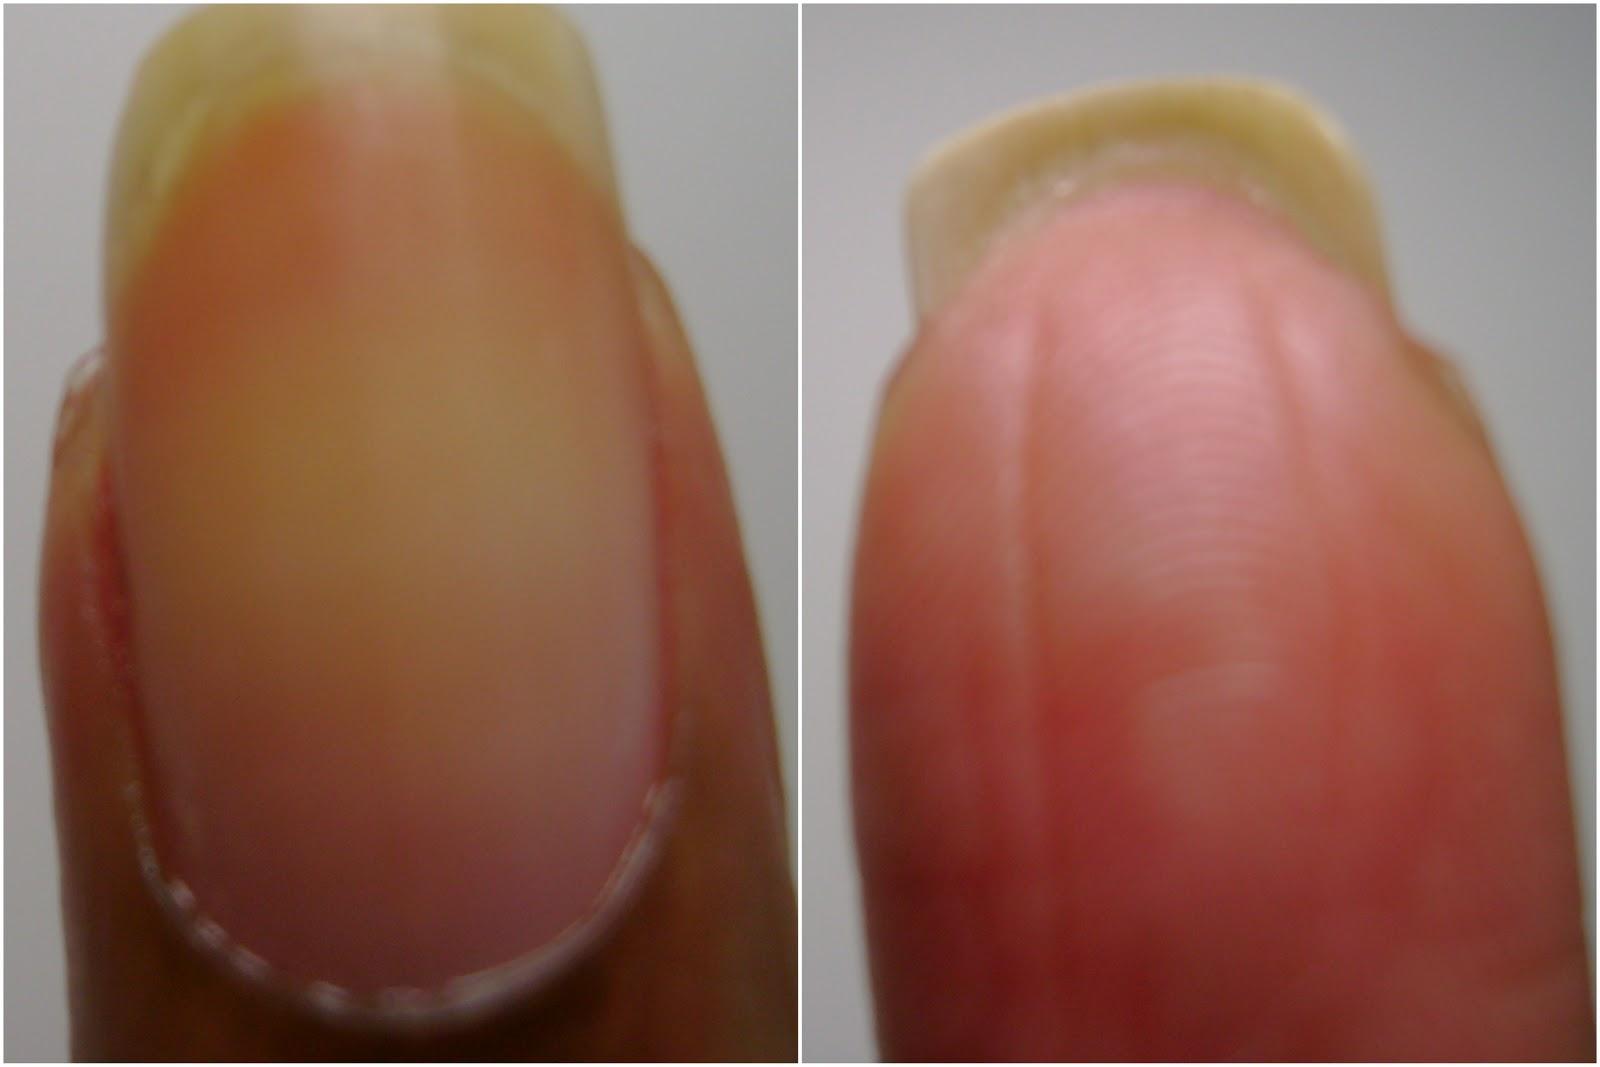 Scarlet Fanny Fingernail Anatomy Nail Saving Tips